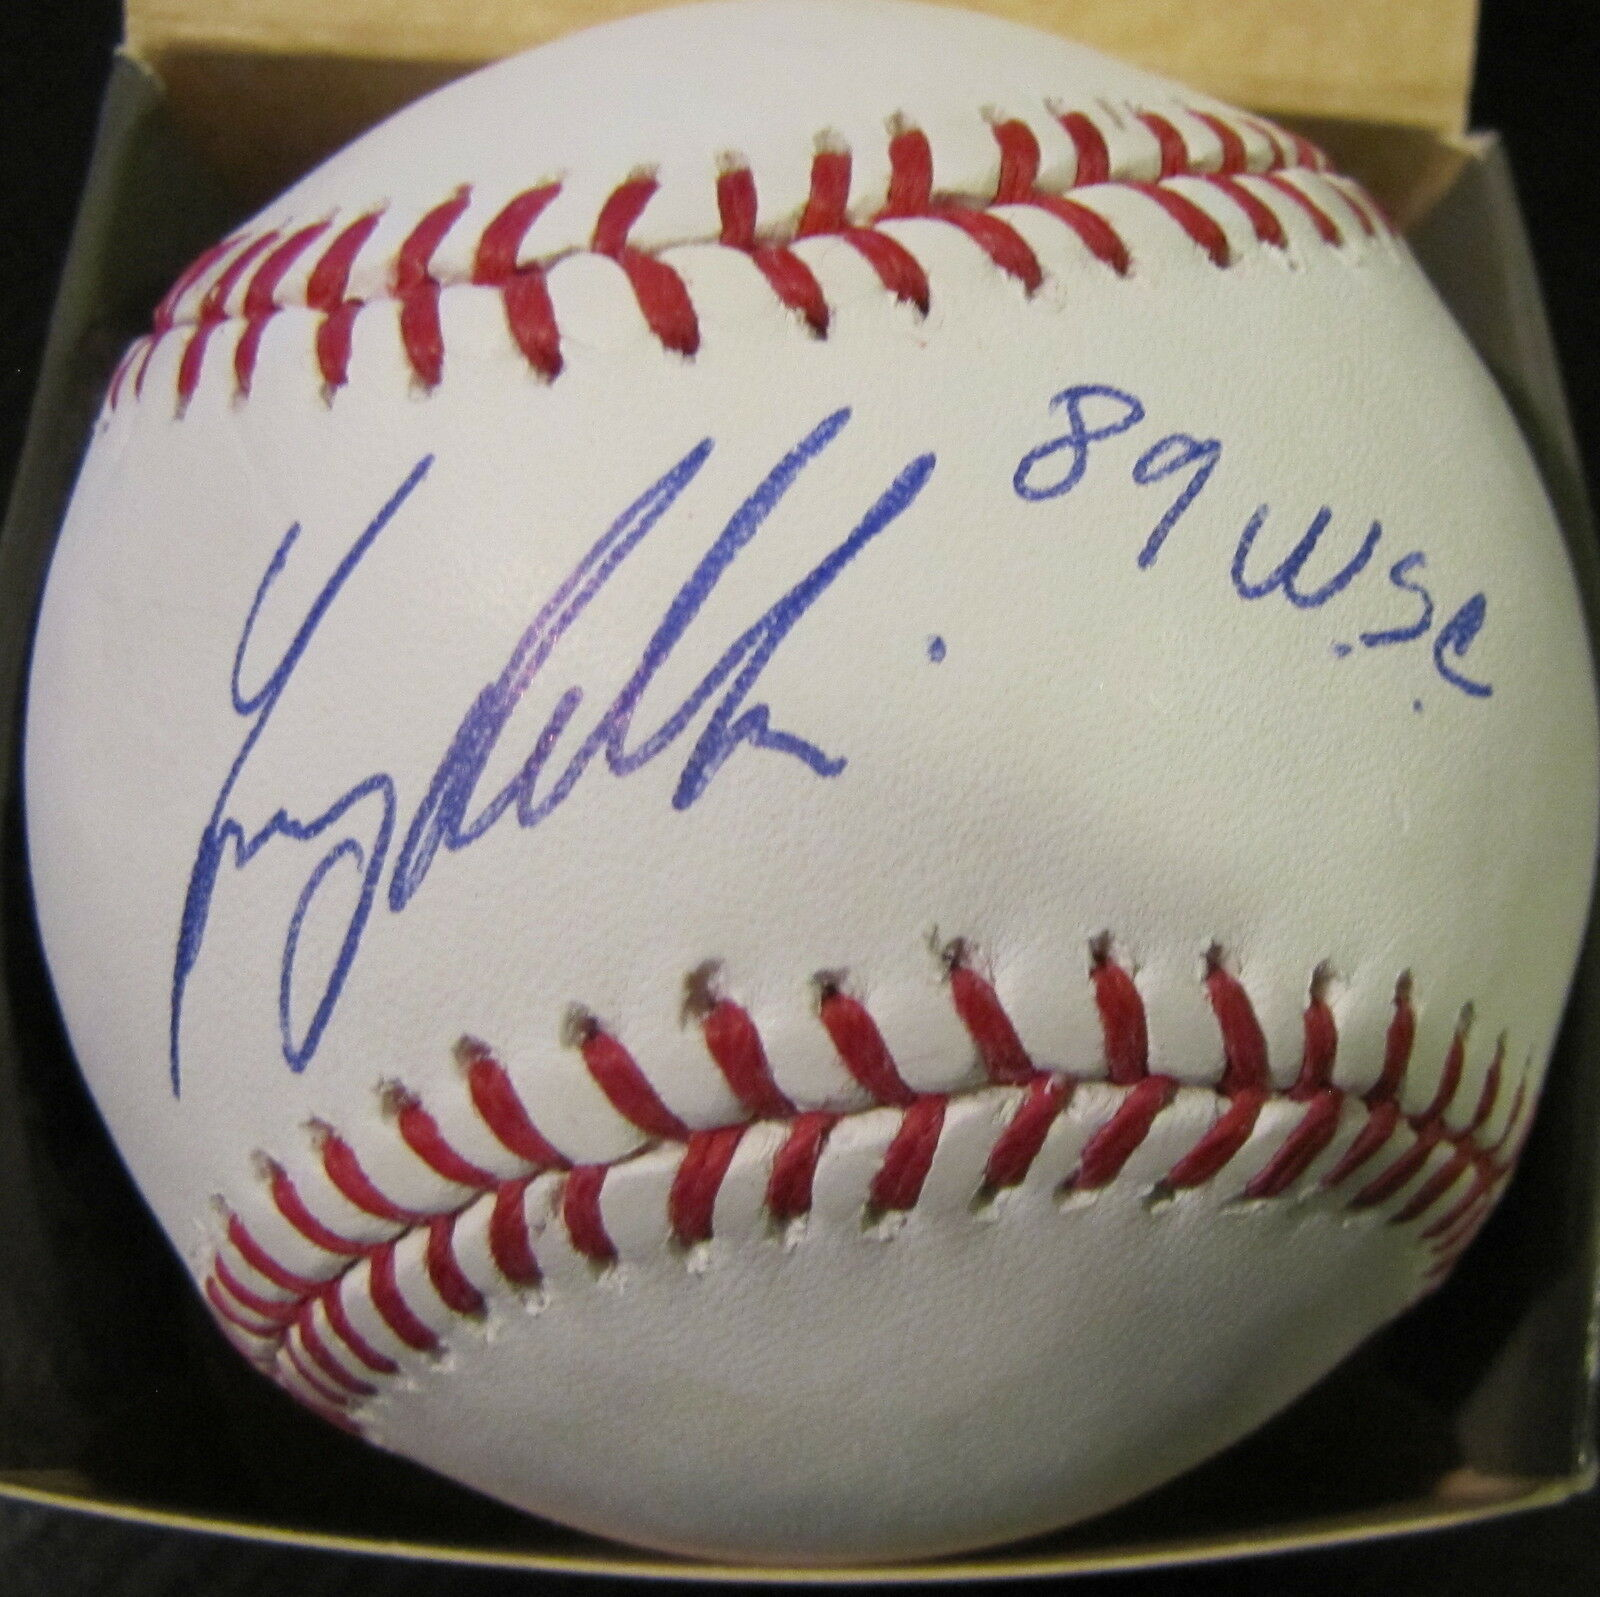 Tony Phillips Oakland Oakland Oakland A'S 89 Wsc Firmado Oficial Major League Béisbol 75bfc9